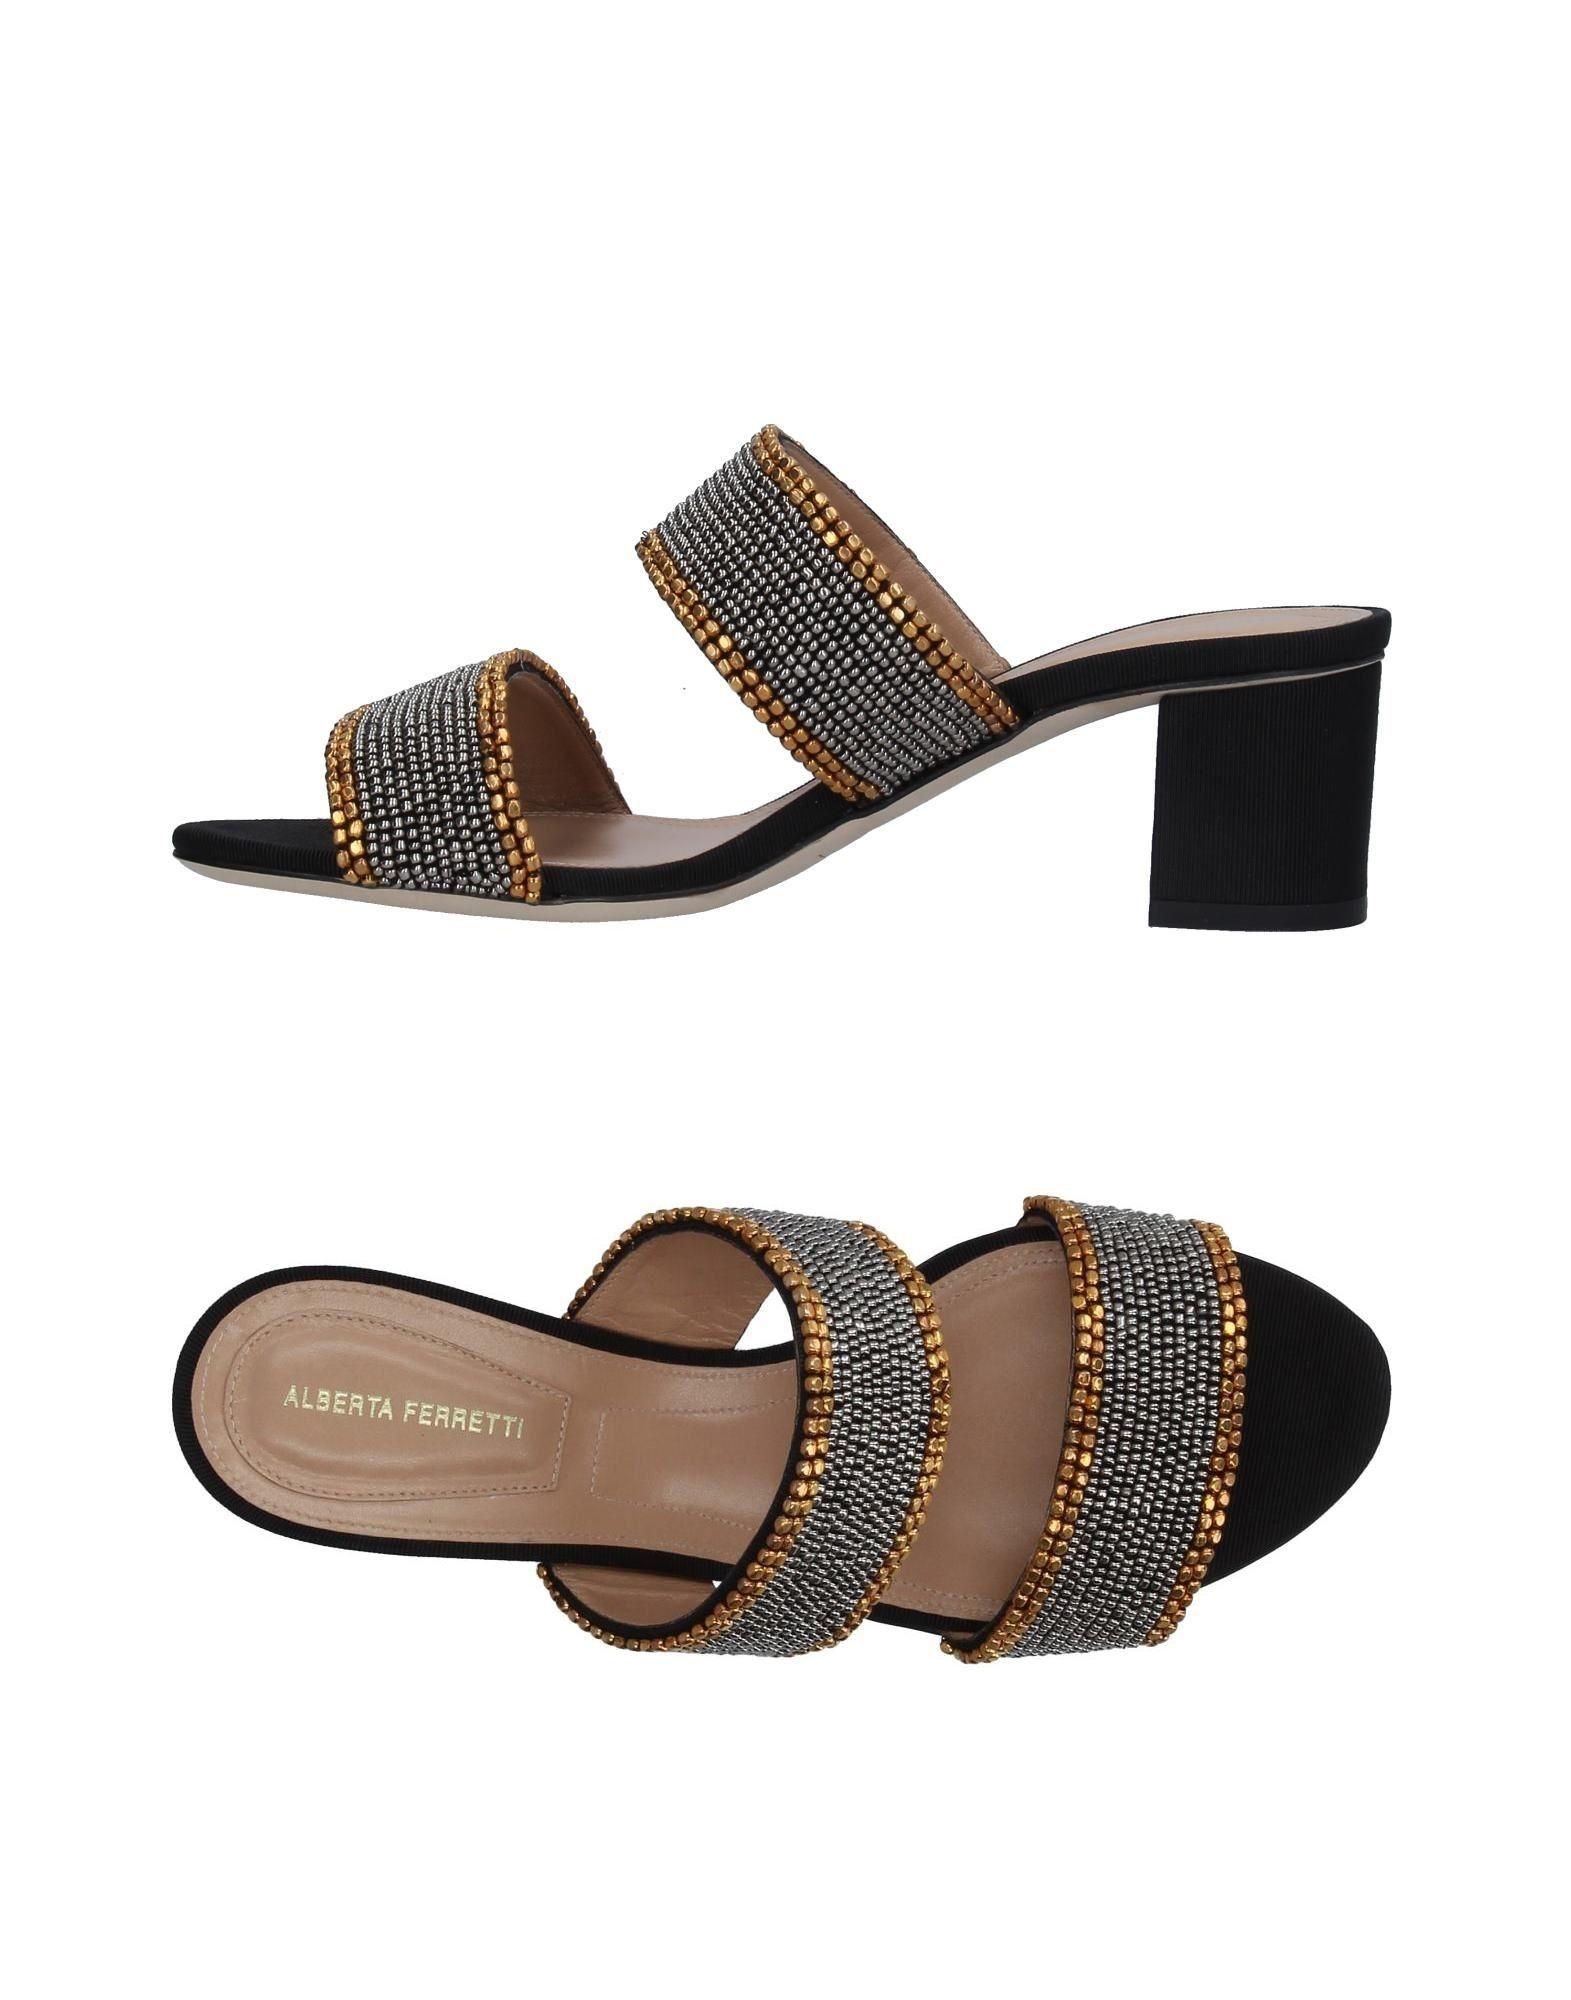 Alberta Ferretti Sandalen Damen  11326820AVGünstige gut aussehende Schuhe